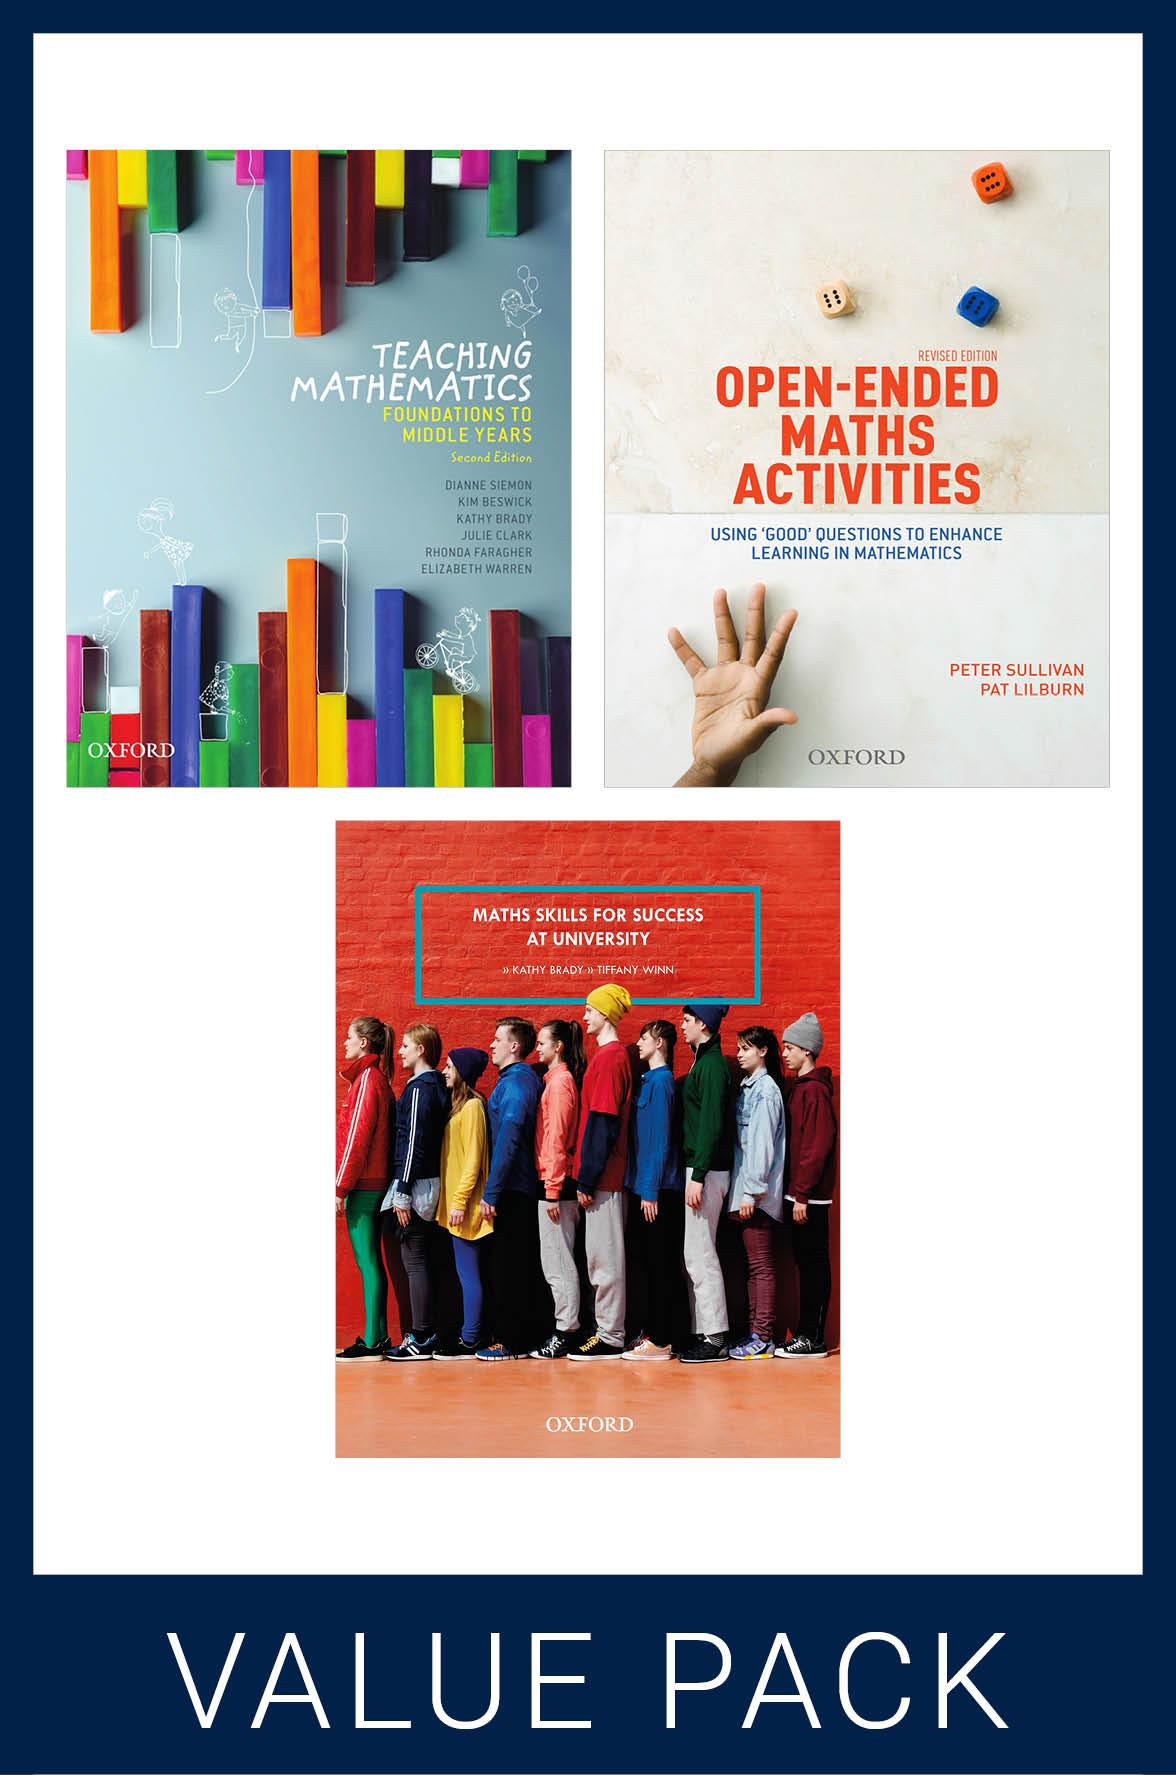 Canberra University Maths Education Value Pack